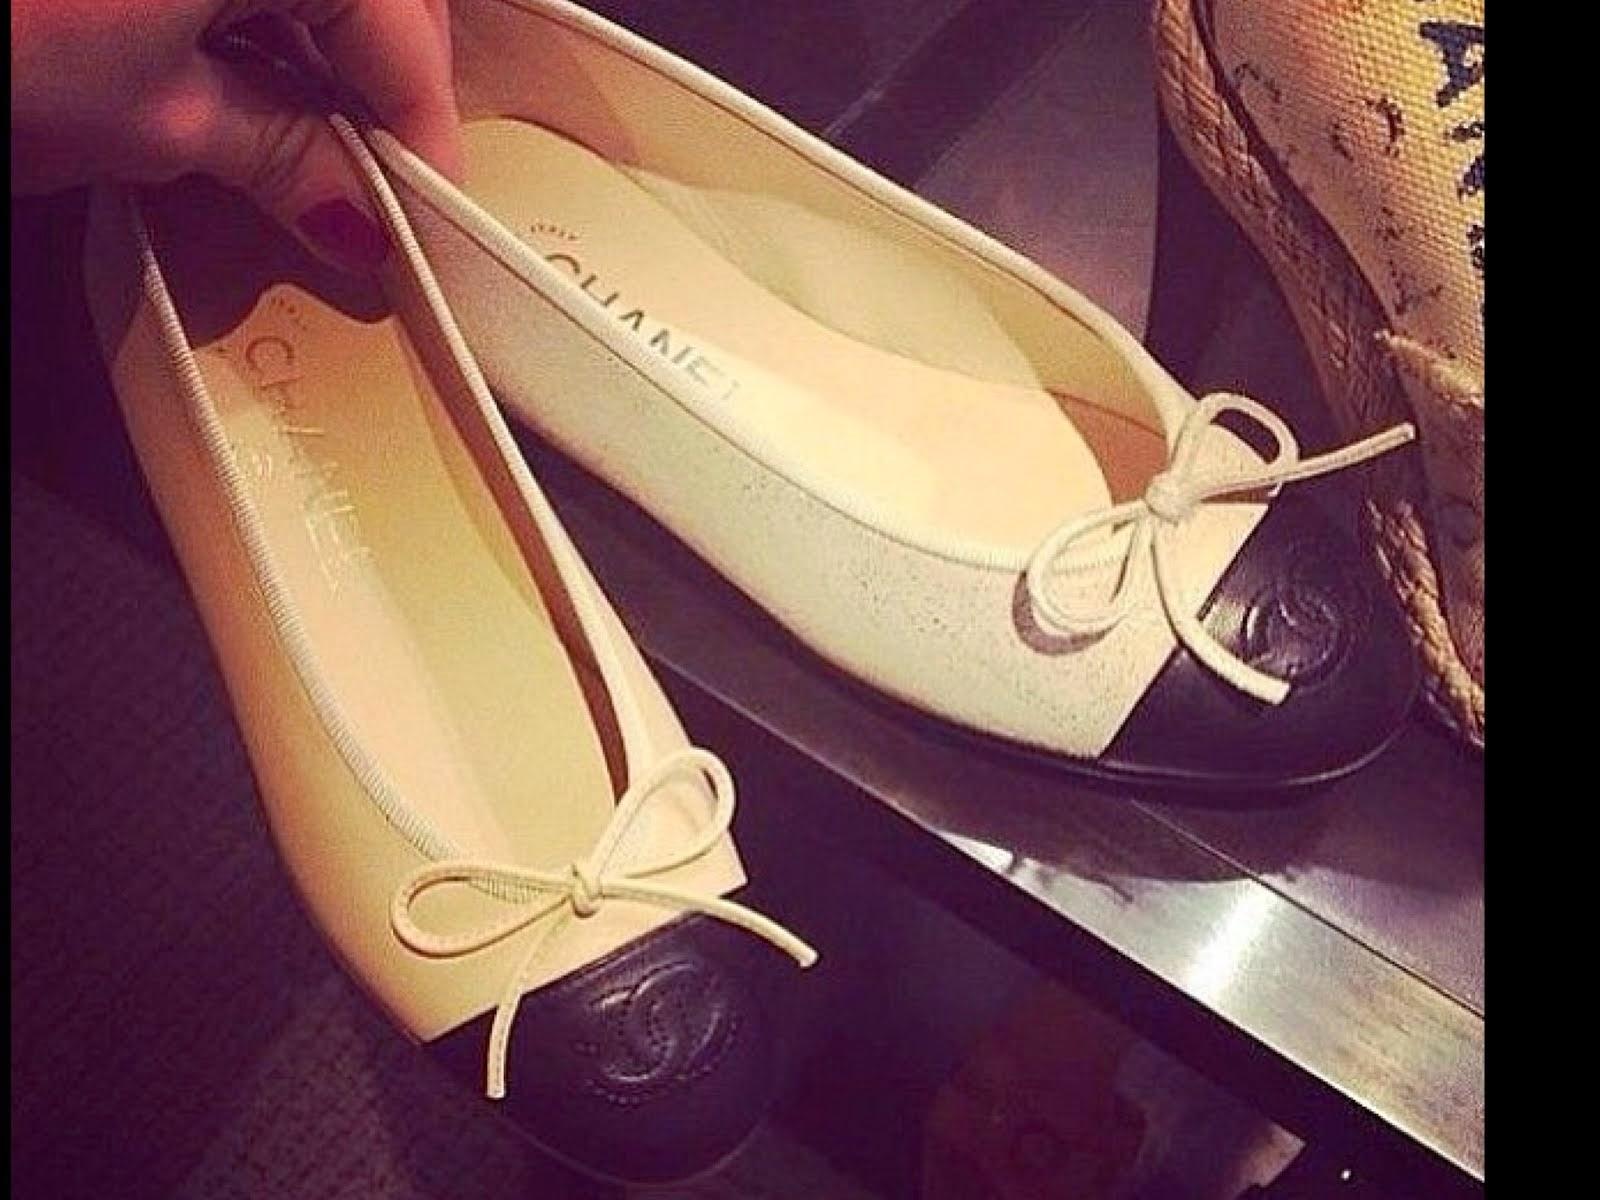 Sapatilhas Chanel